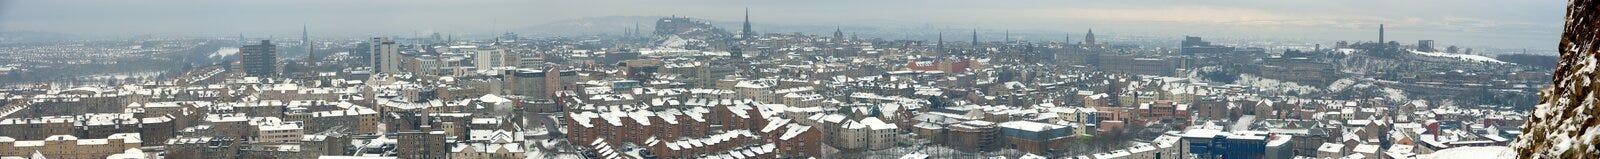 Panorama d'Edimbourg, Ecosse, dans la neige Photo stock